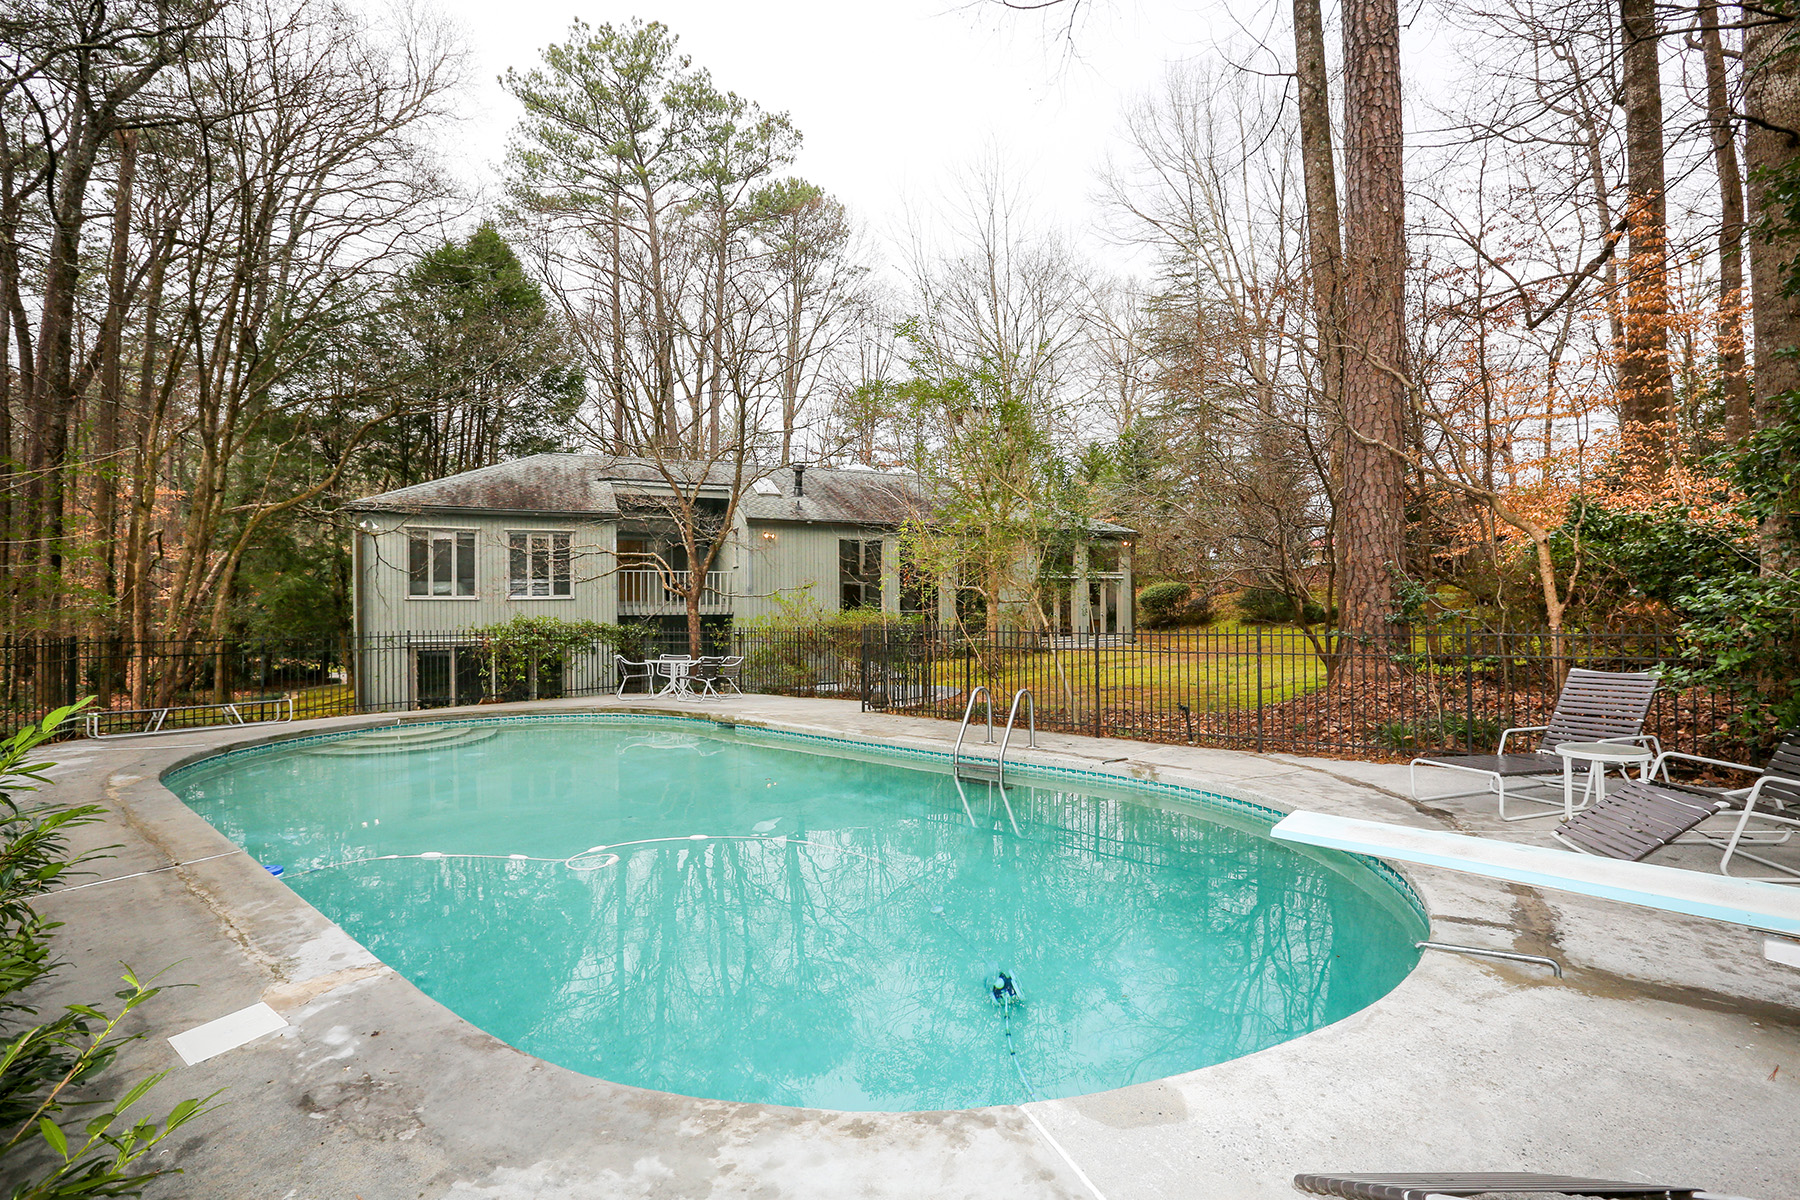 A Contemporary Home Designed By Frank Lloyd Wright Apprentice On 2+ Acres 6405 Riverside Drive Atlanta, Geórgia 30328 Estados Unidos